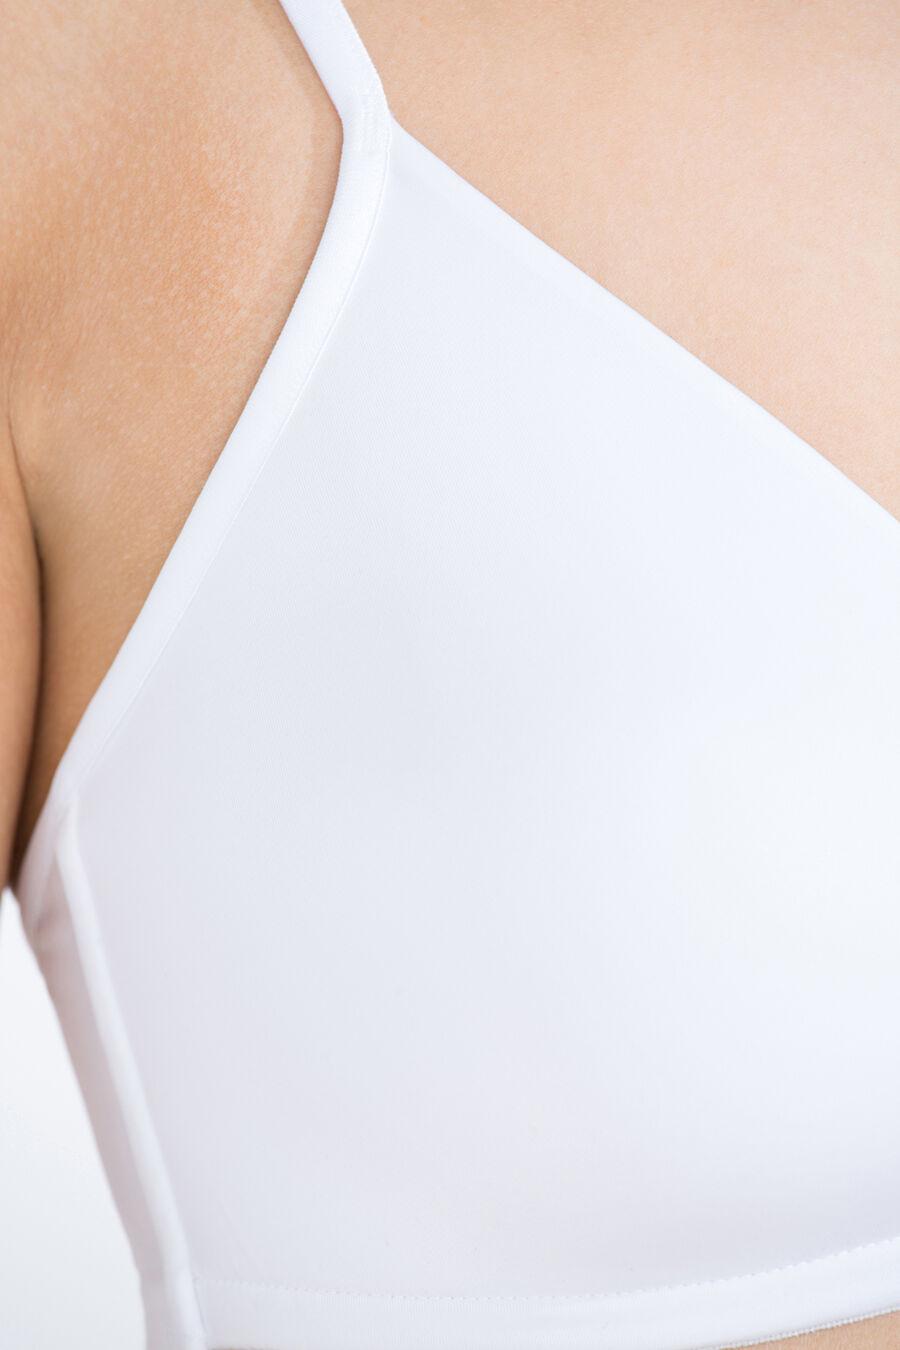 Wireless triangular padded bra